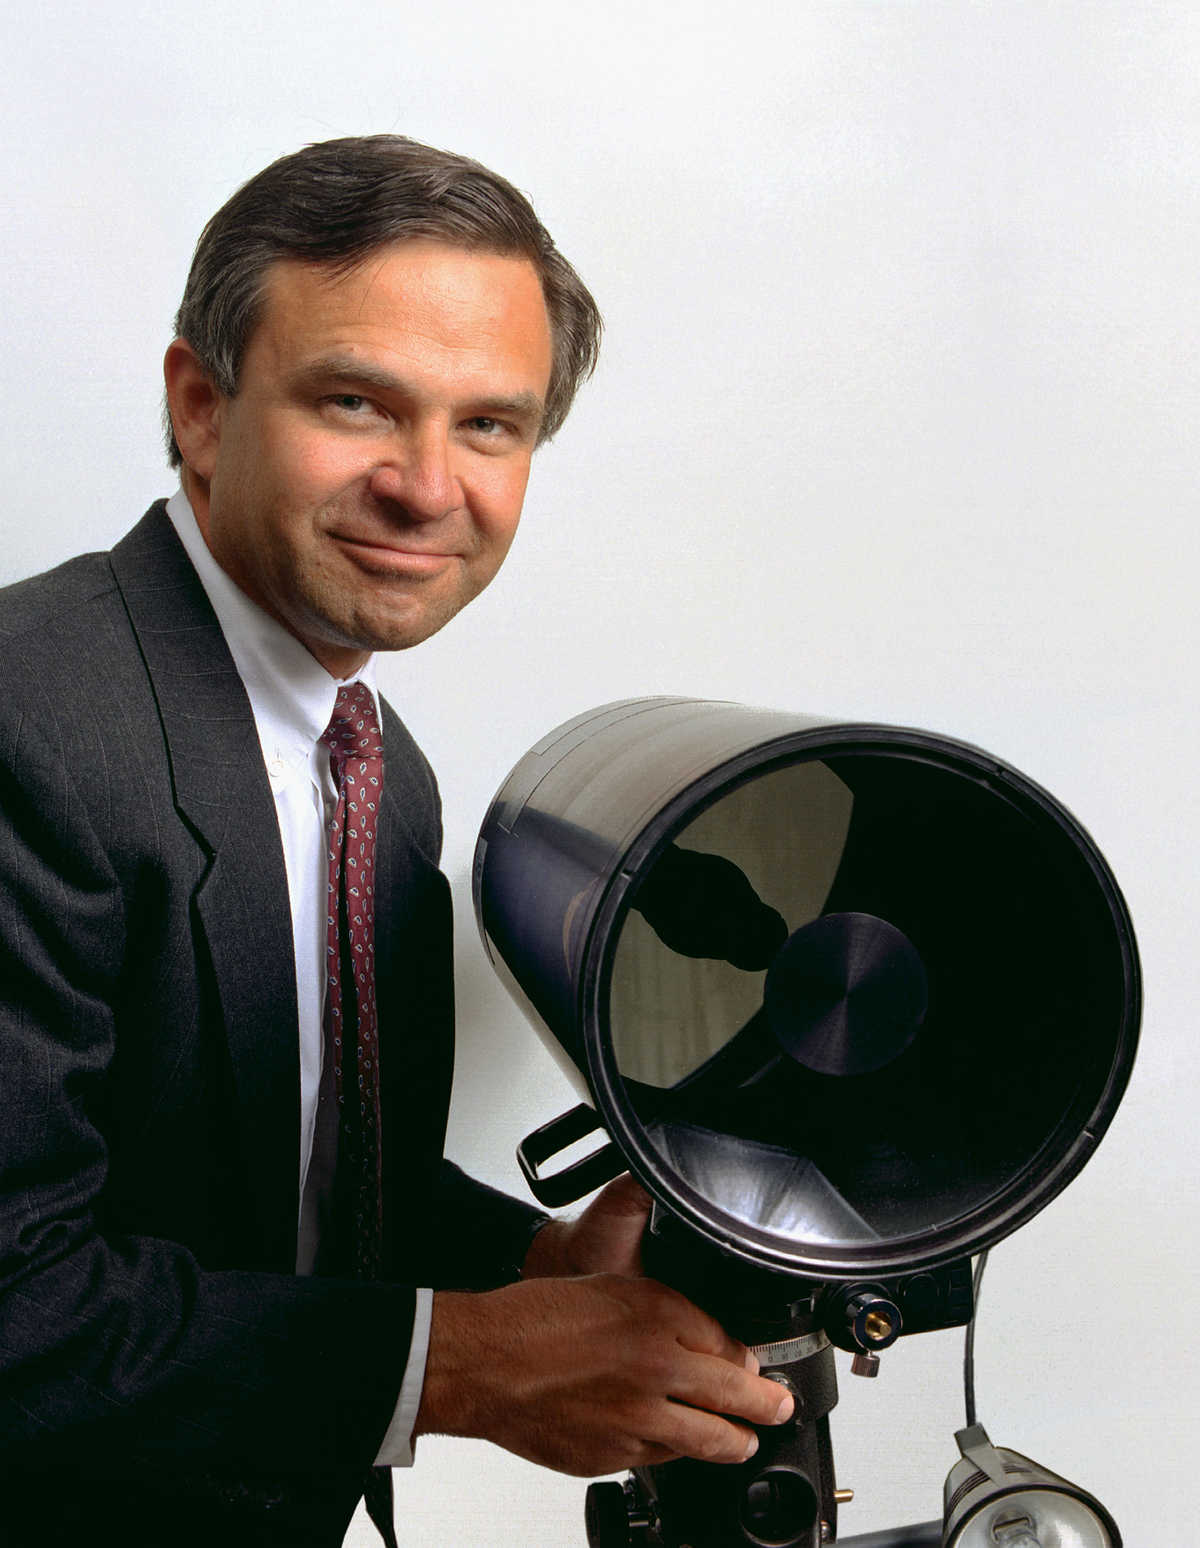 Dr. David C. Slater